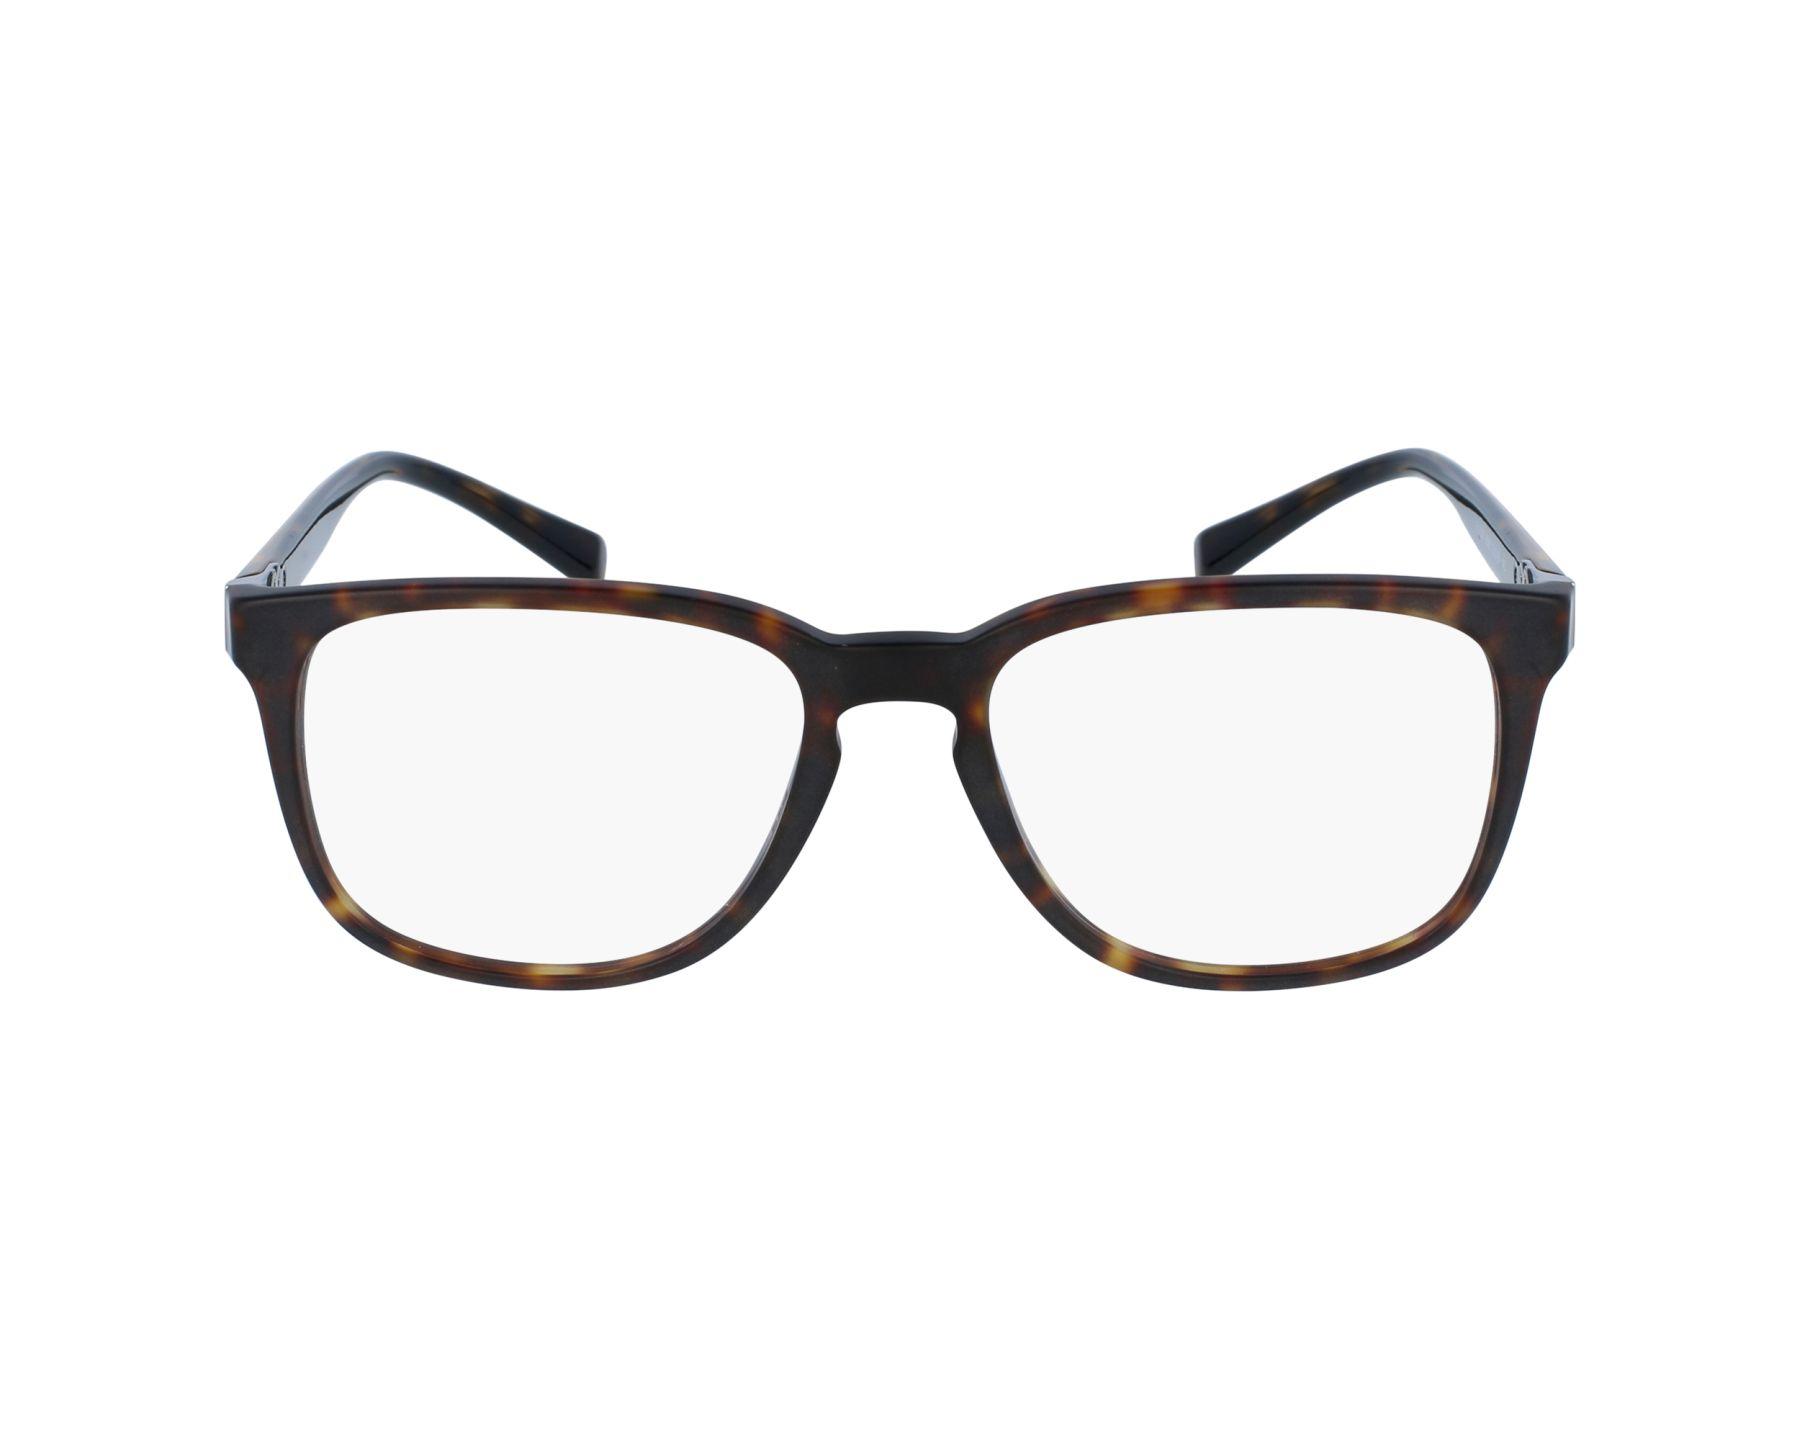 Buy Burberry Eyeglasses BE-2239 3536 Online - Visionet